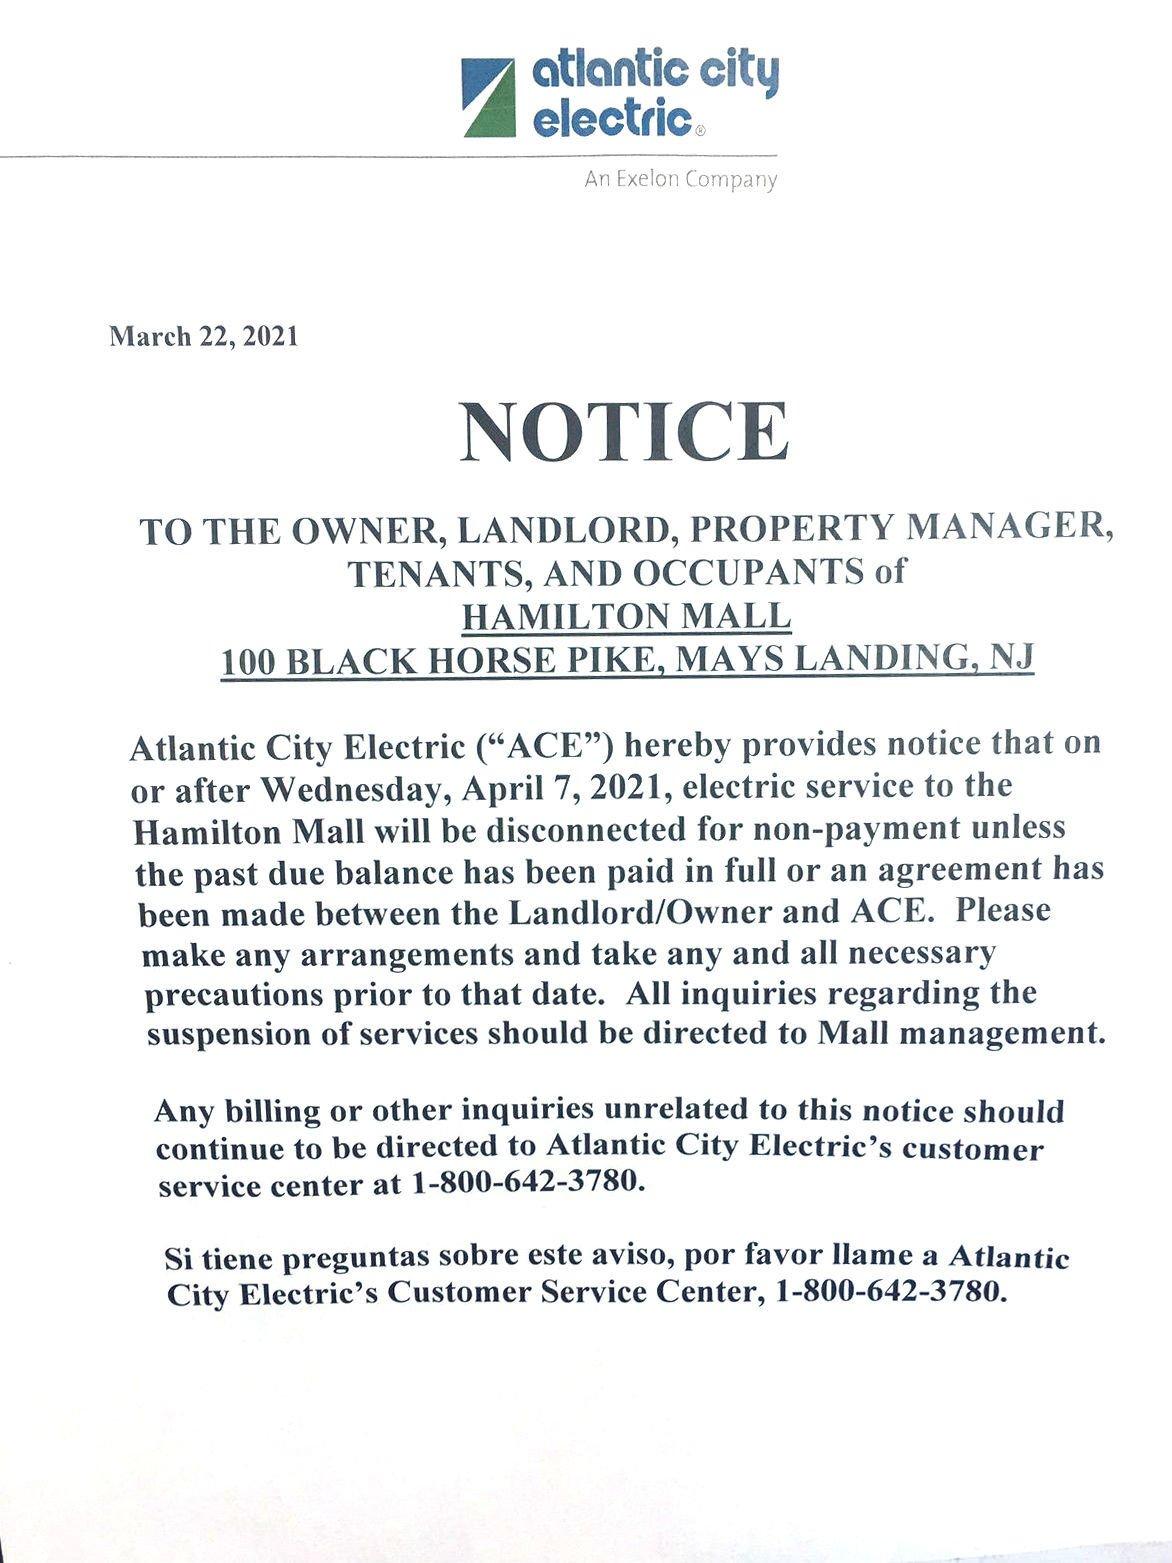 Atlantic City Electric notice at Hamilton Mall